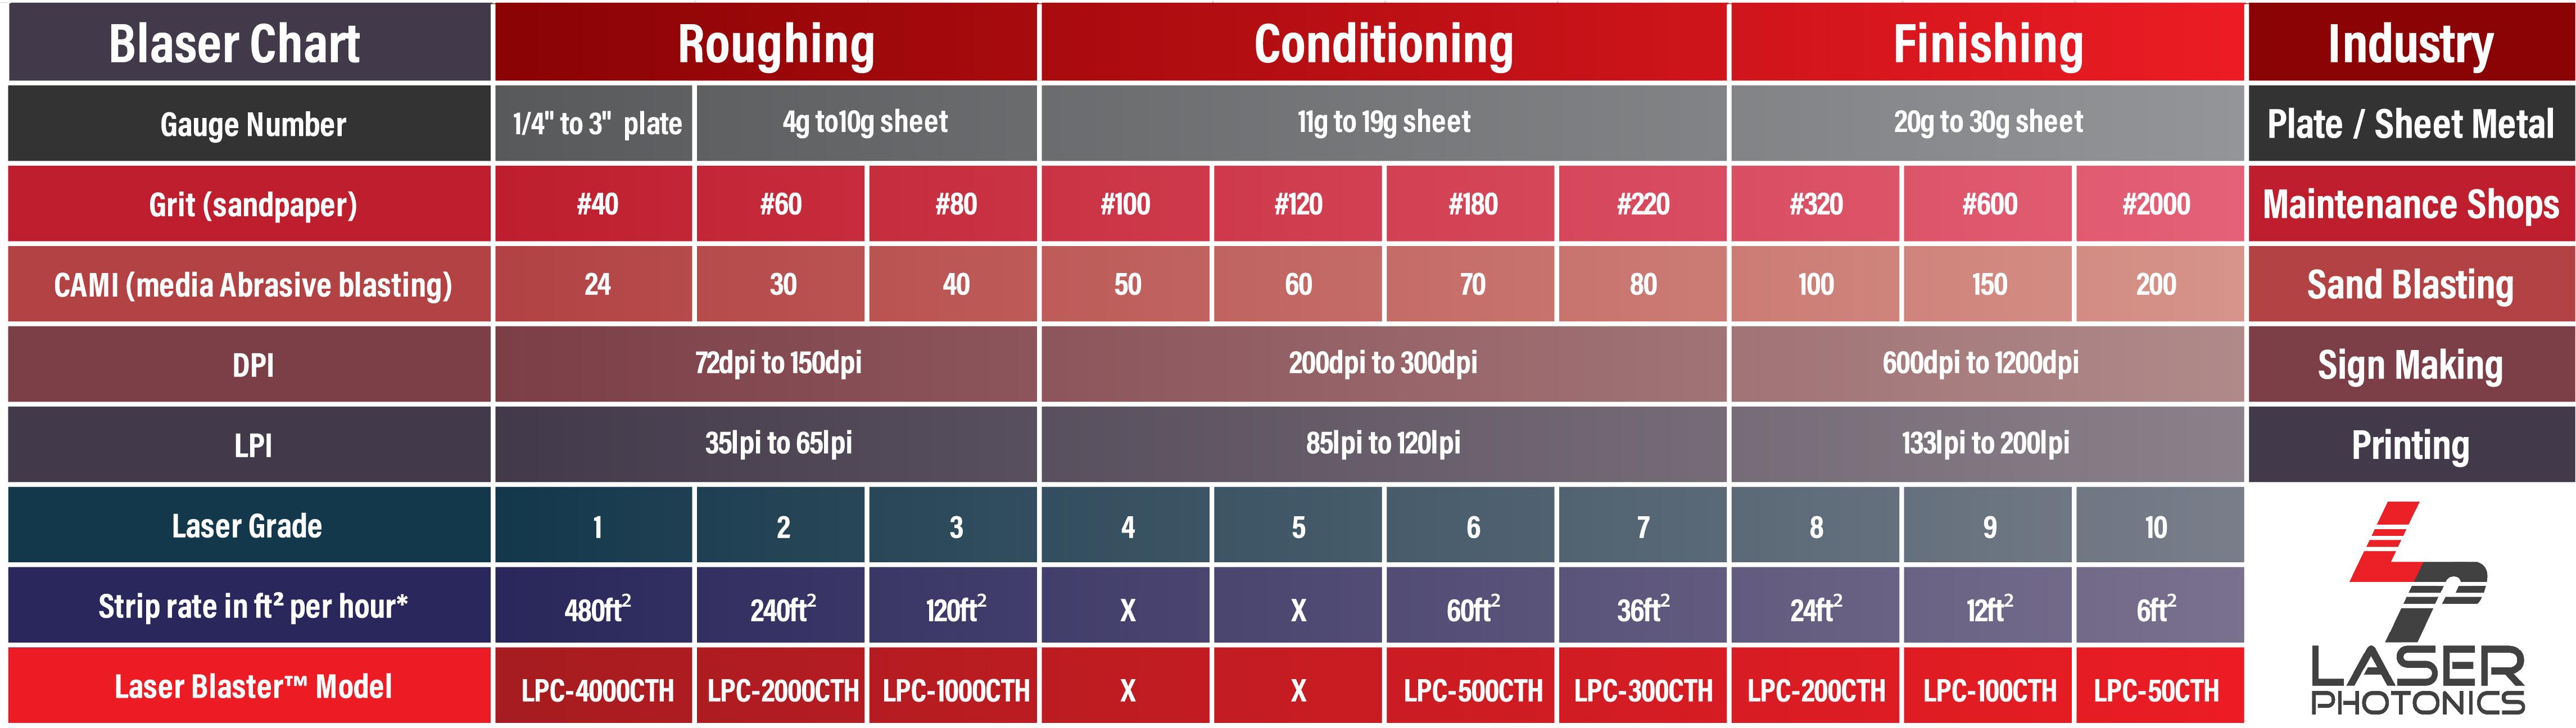 Laser Blaster Matching Chart